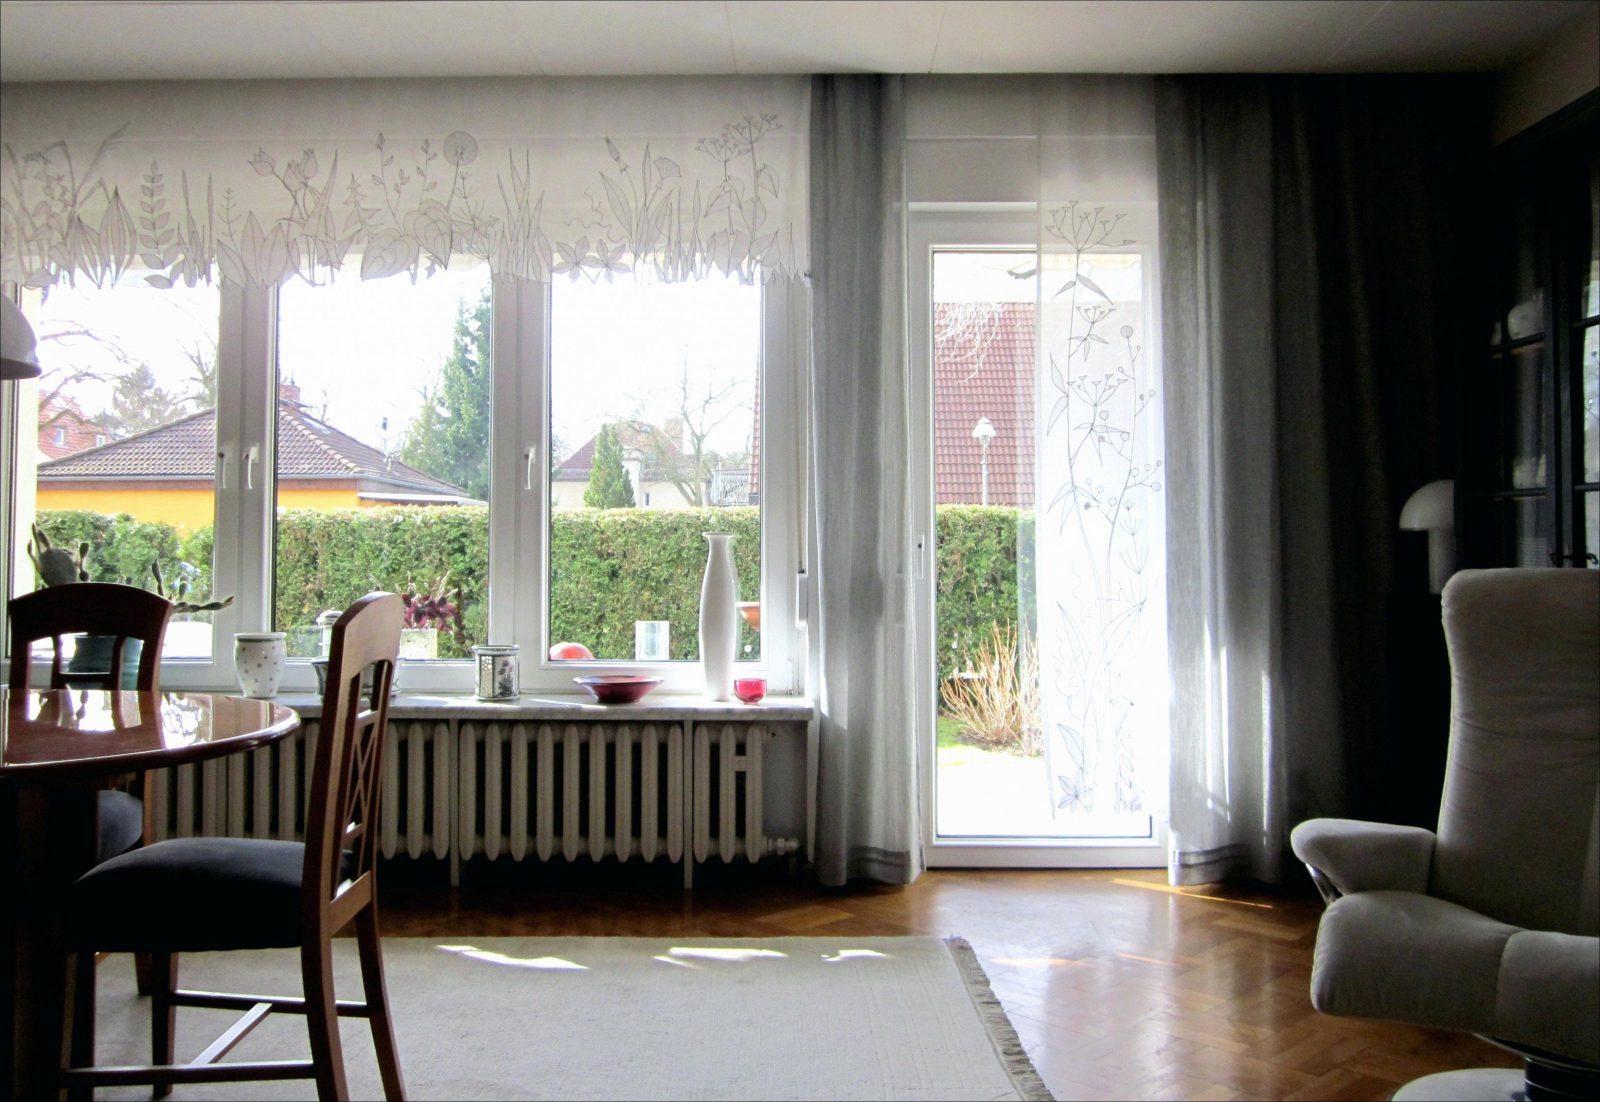 Full Size of Scheibengardinen Balkontür Küche Wohnzimmer Scheibengardinen Balkontür